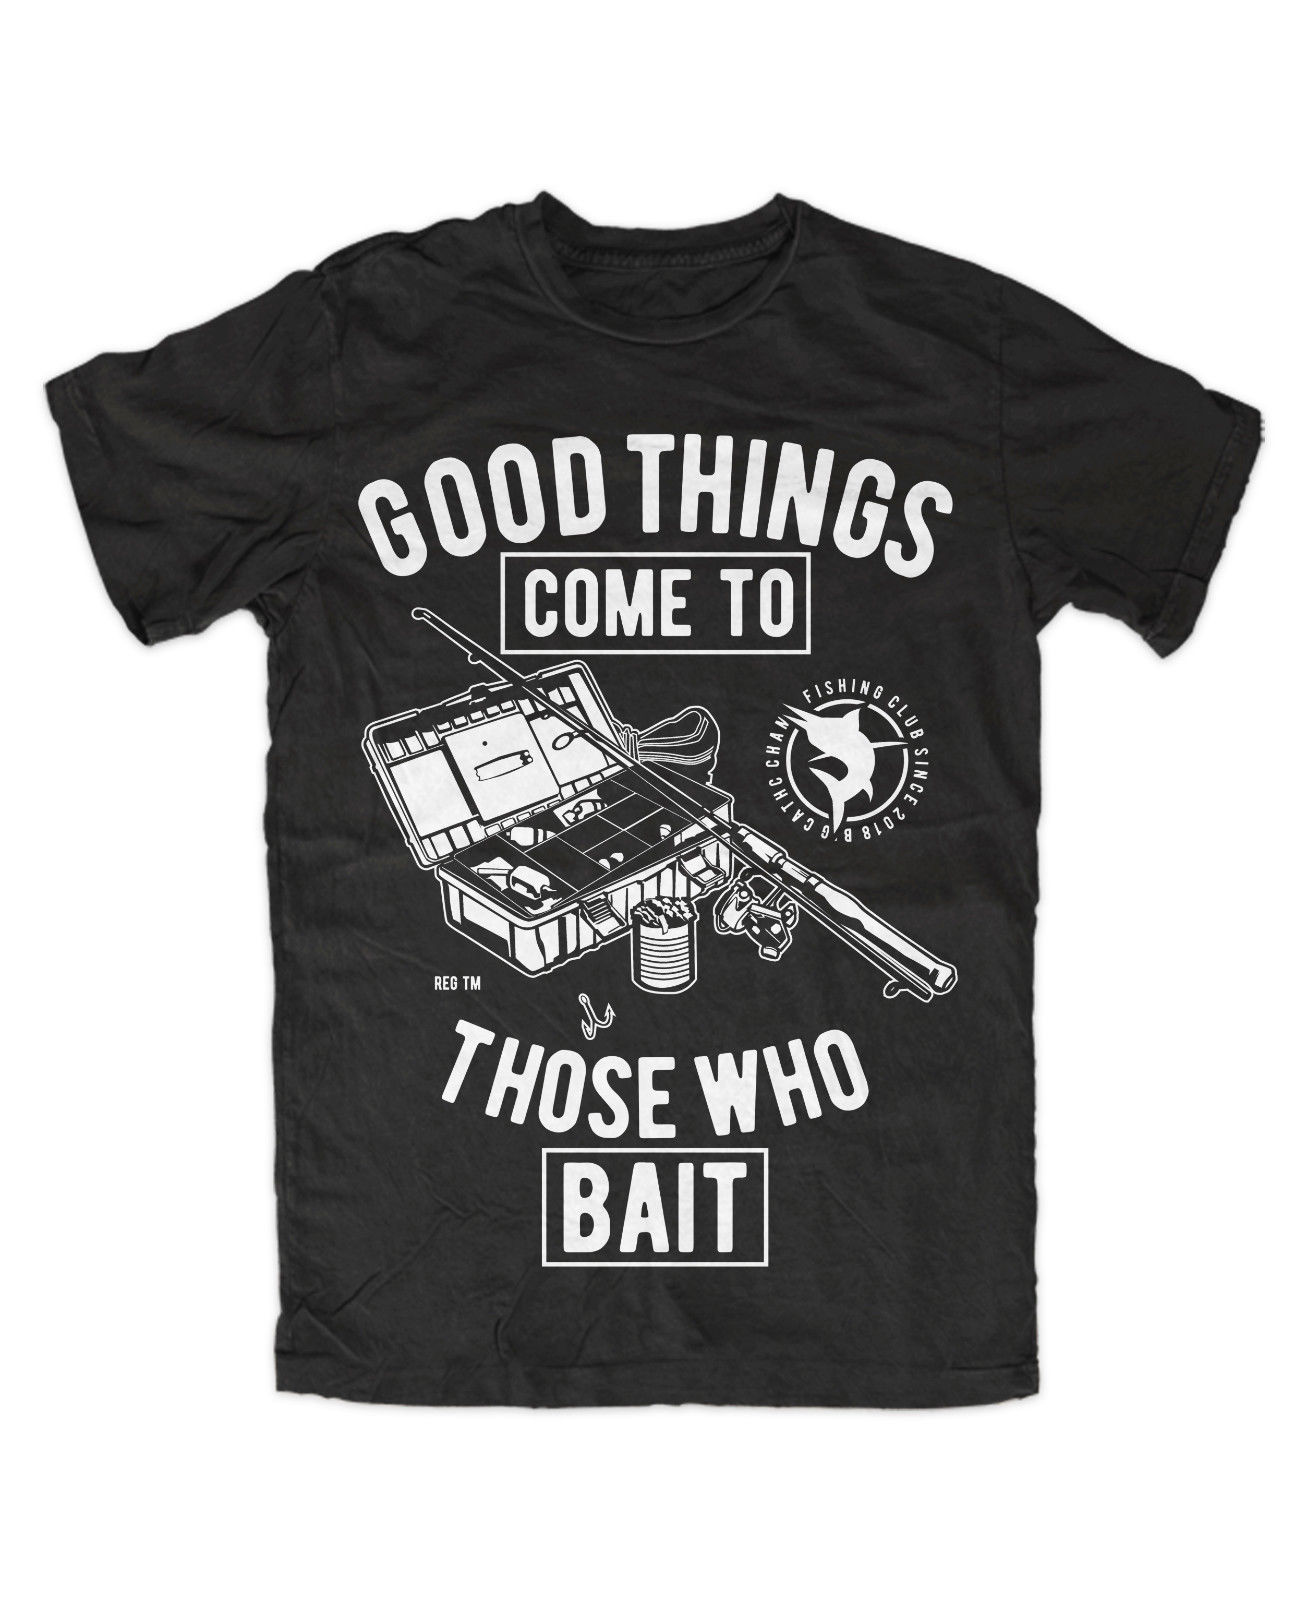 Ropa de marca para hombre Cool O-Neck Tops Angler 2 camiseta Premium divertida, reclamaciones, Lachs Angeln, dorsh, zander. Hechtmy T camisa